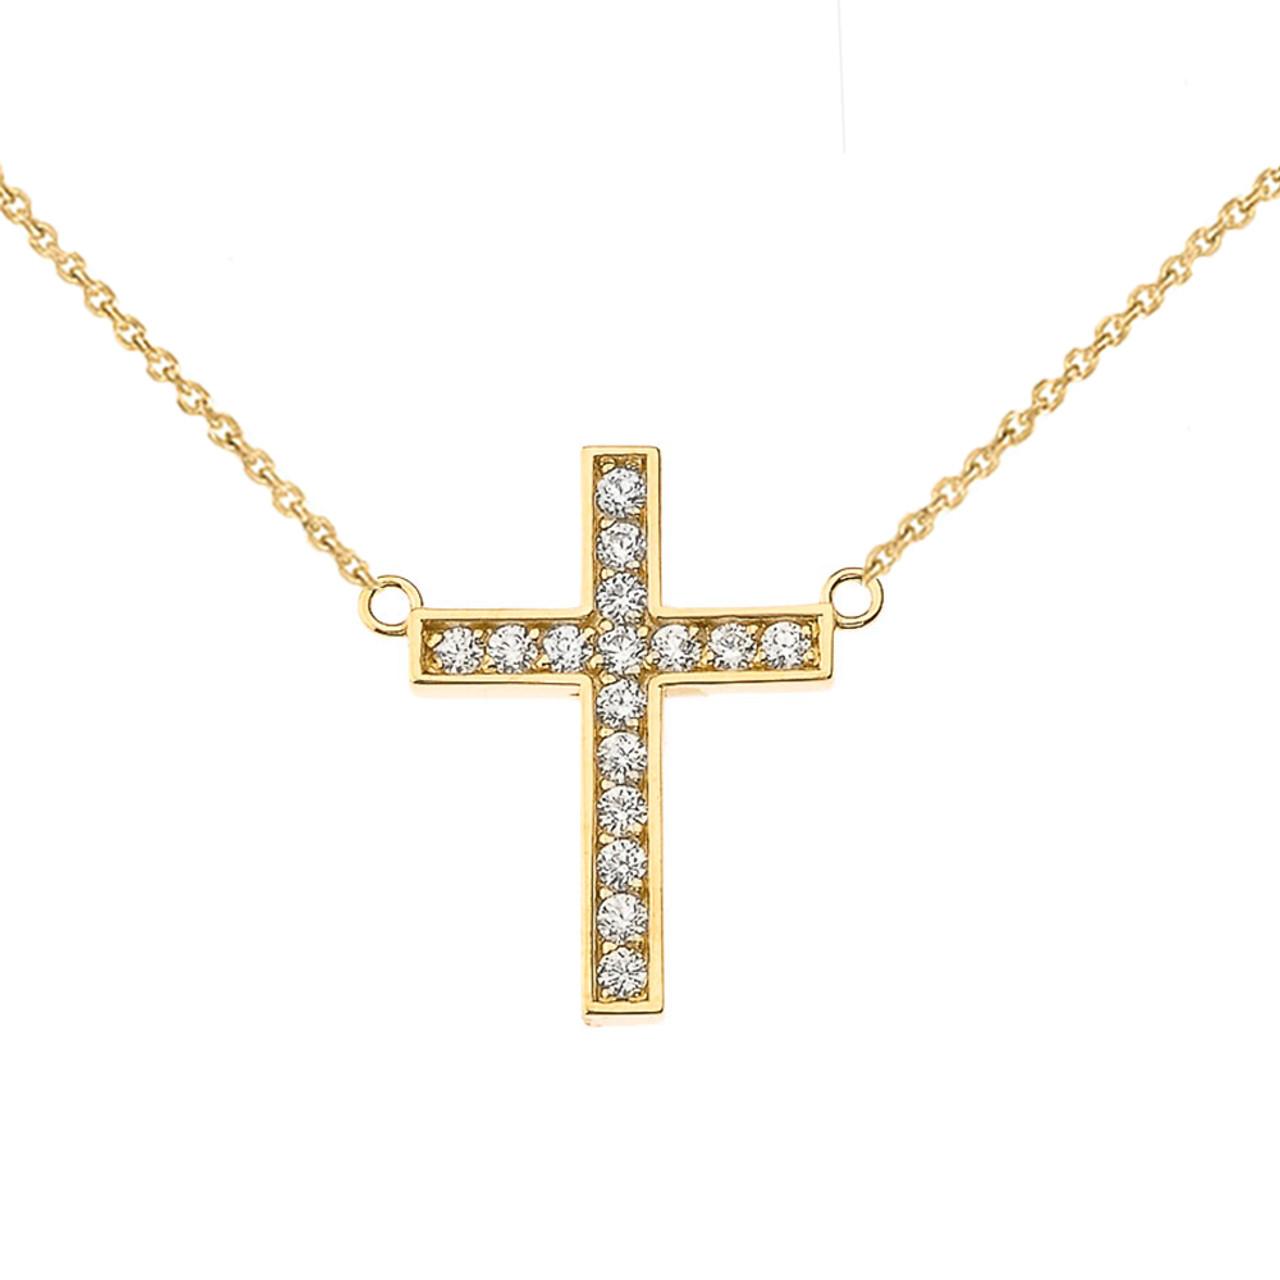 Elegant 10k White Gold CZ with White Topaz Center Stone Chic Hamsa Pendant Necklace